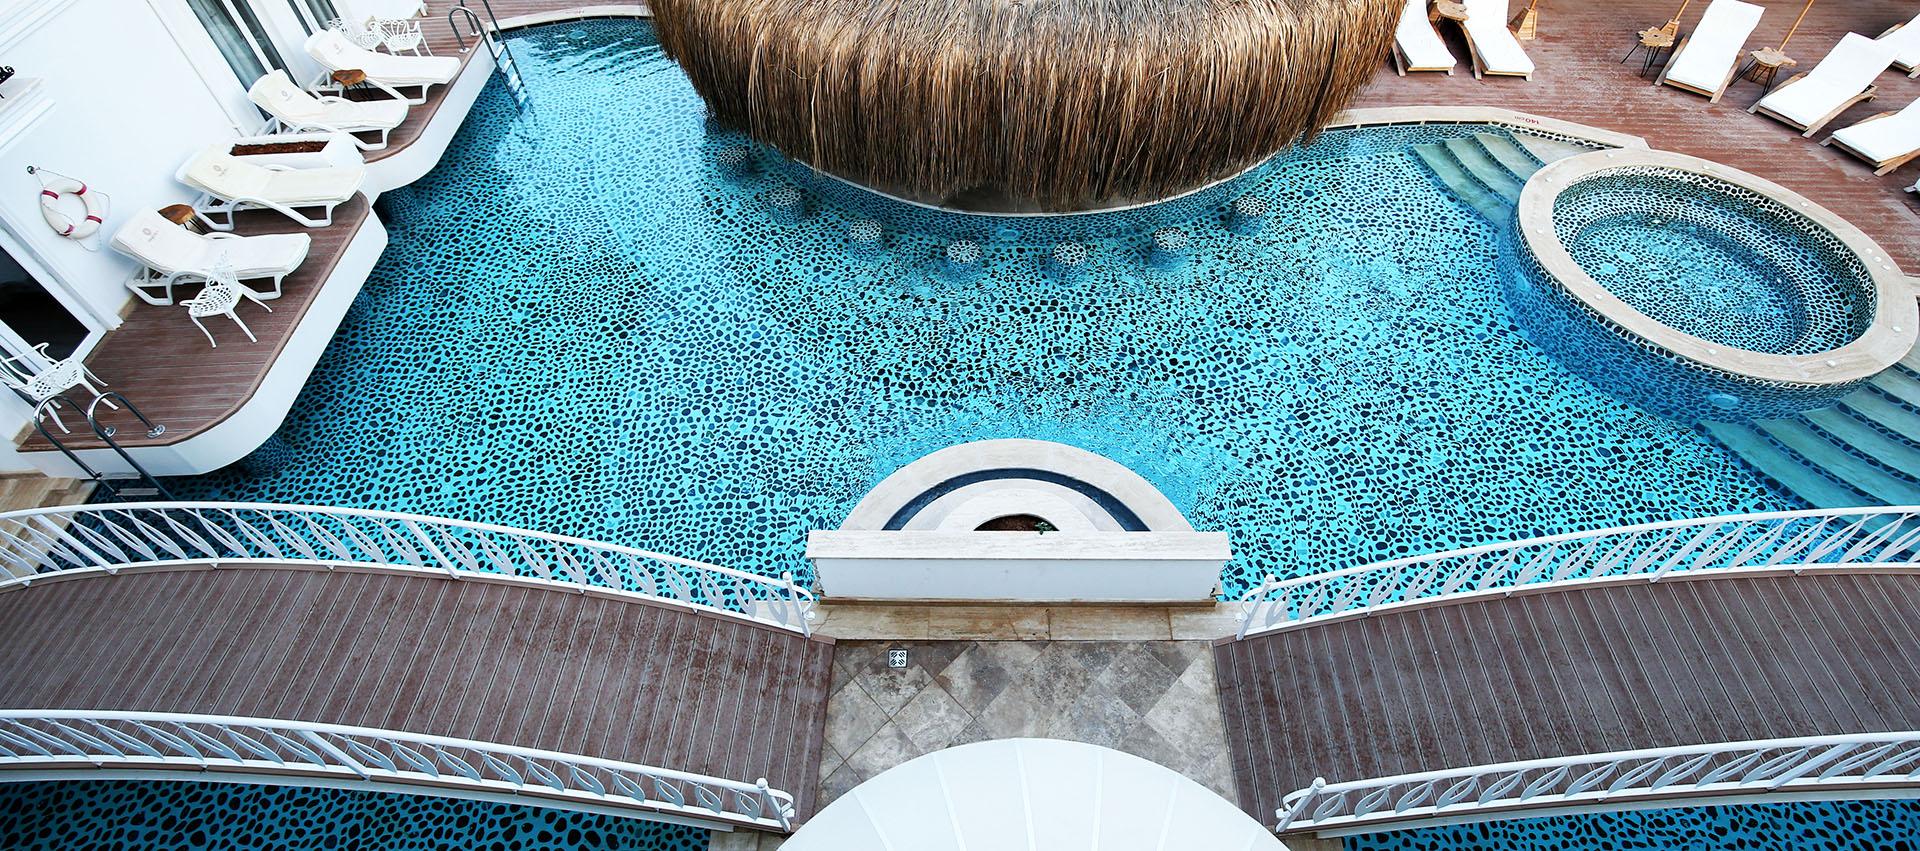 chill pool bar